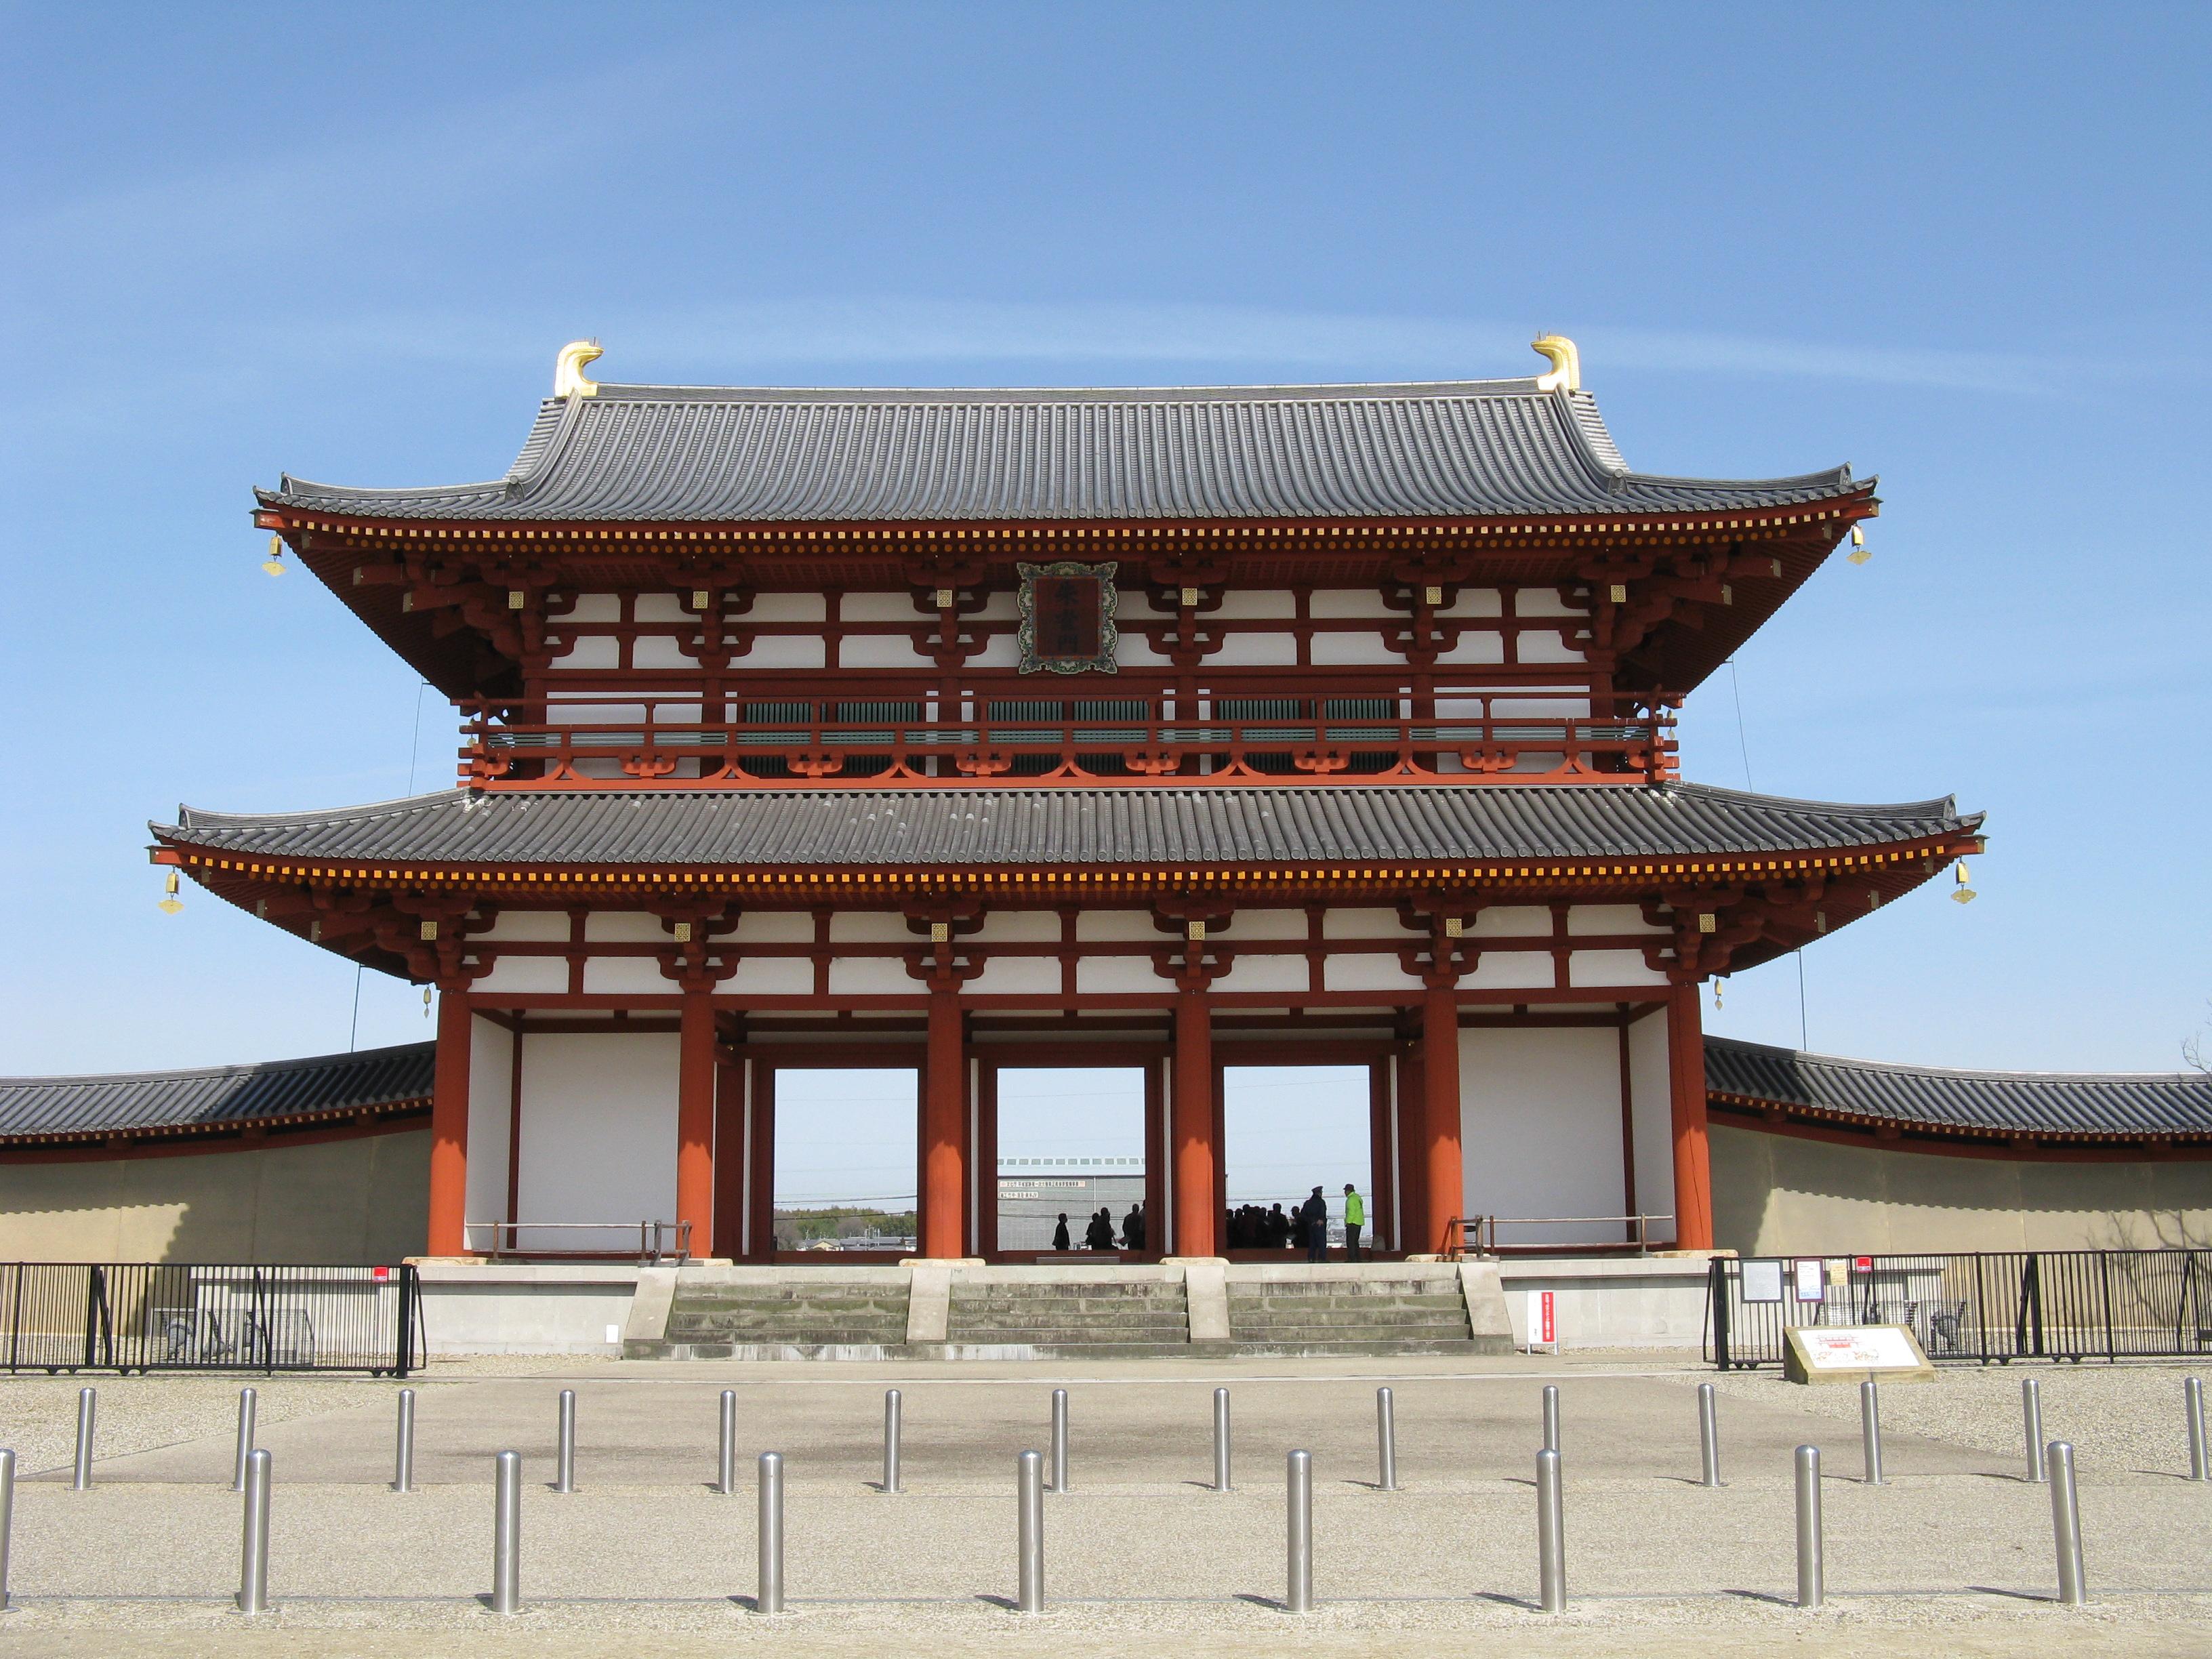 http://upload.wikimedia.org/wikipedia/commons/d/d5/Heijokyo_Suzakumon_05.JPG